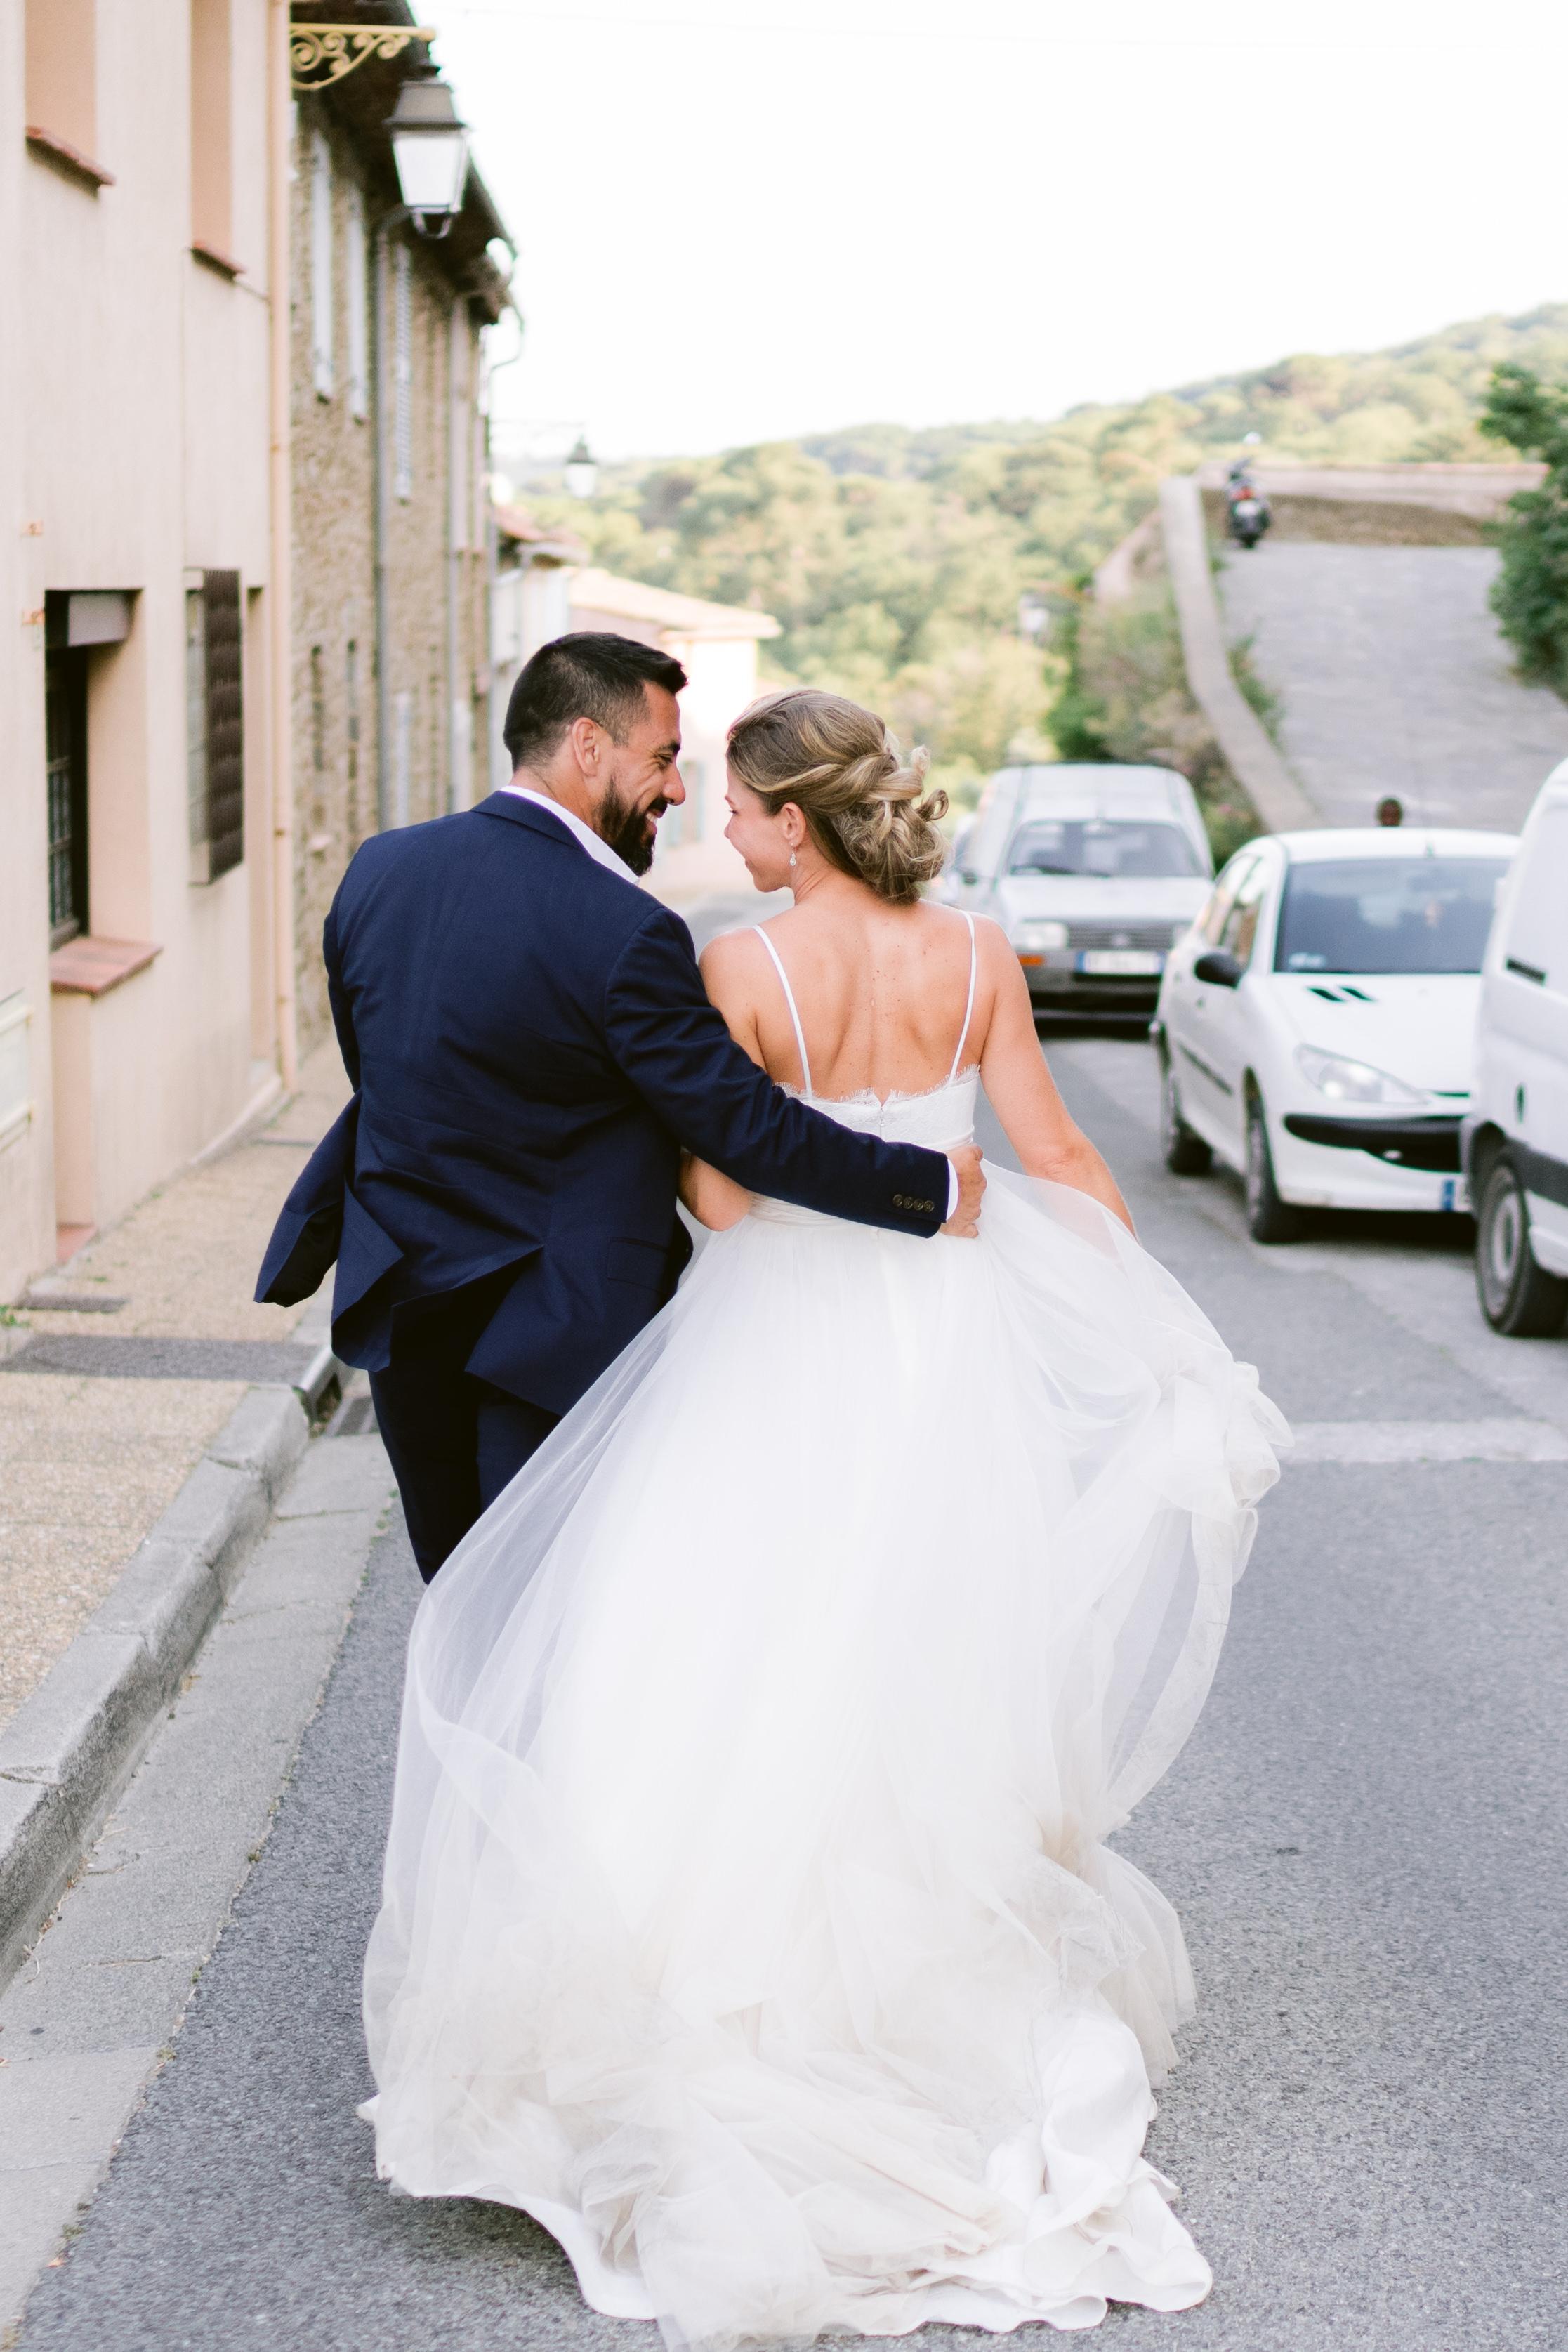 english photographer in france, wedding photographer saint tropez, romantic wedding photography france, chateau wedding france, cote d'azur wedding photographer, ramatuelle wedding (5).jpg